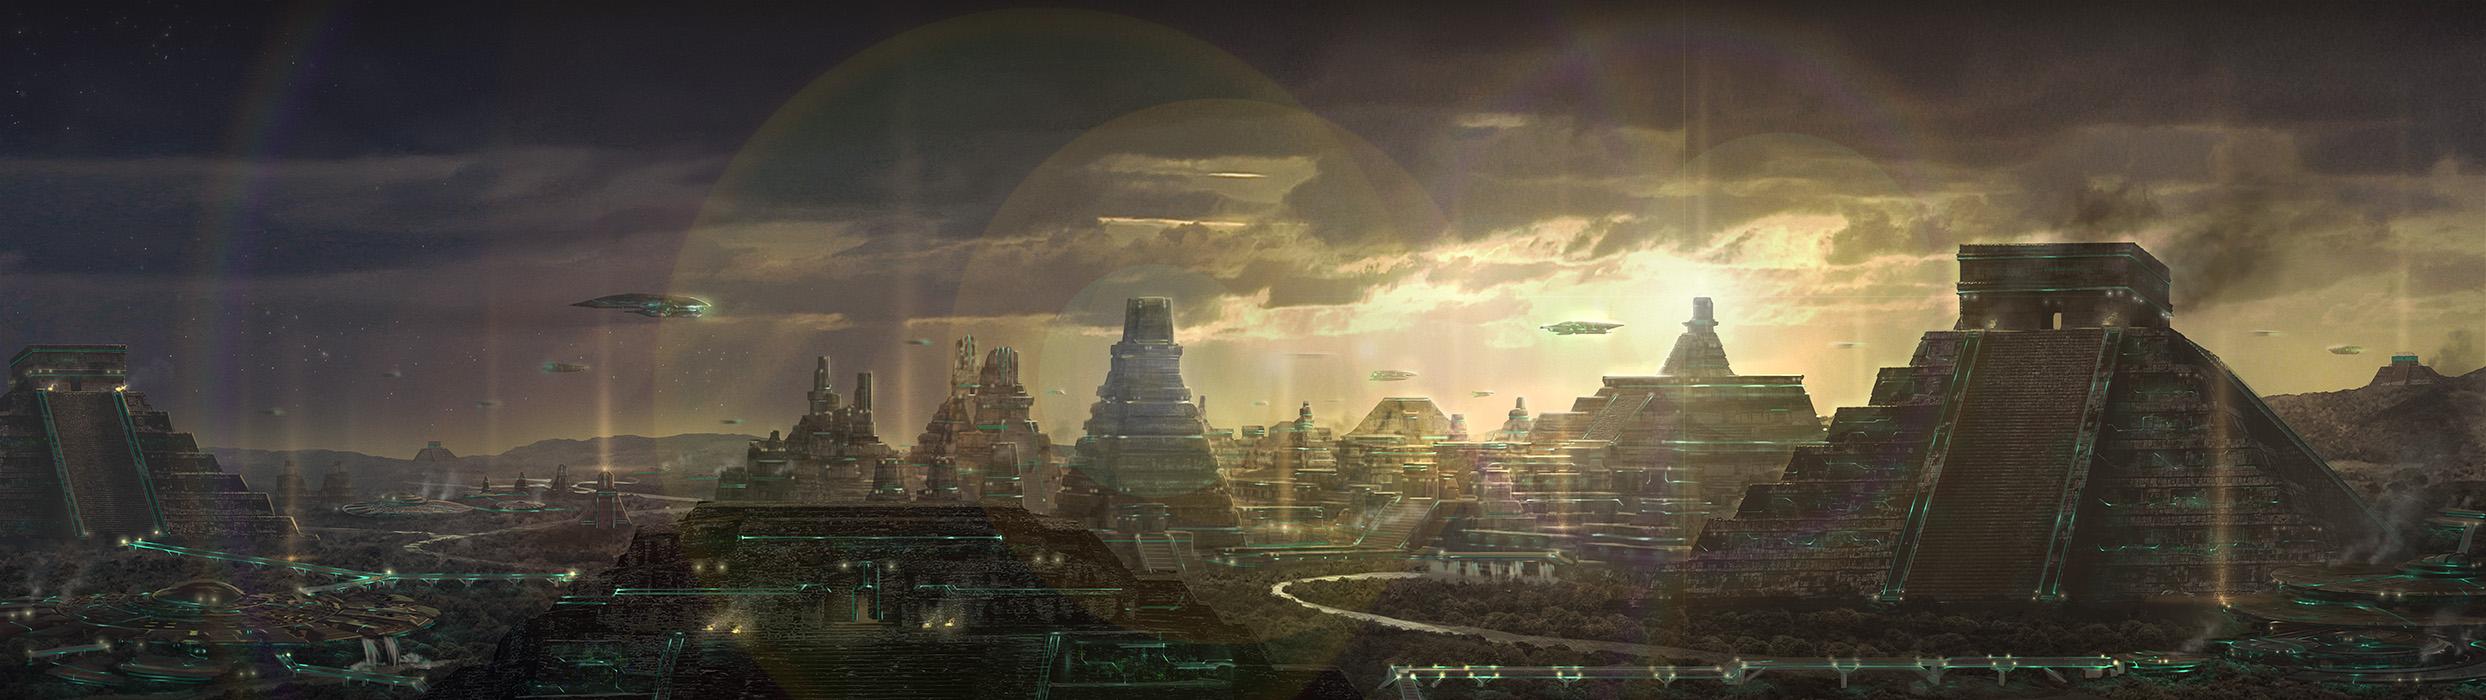 Tikal-001.jpg